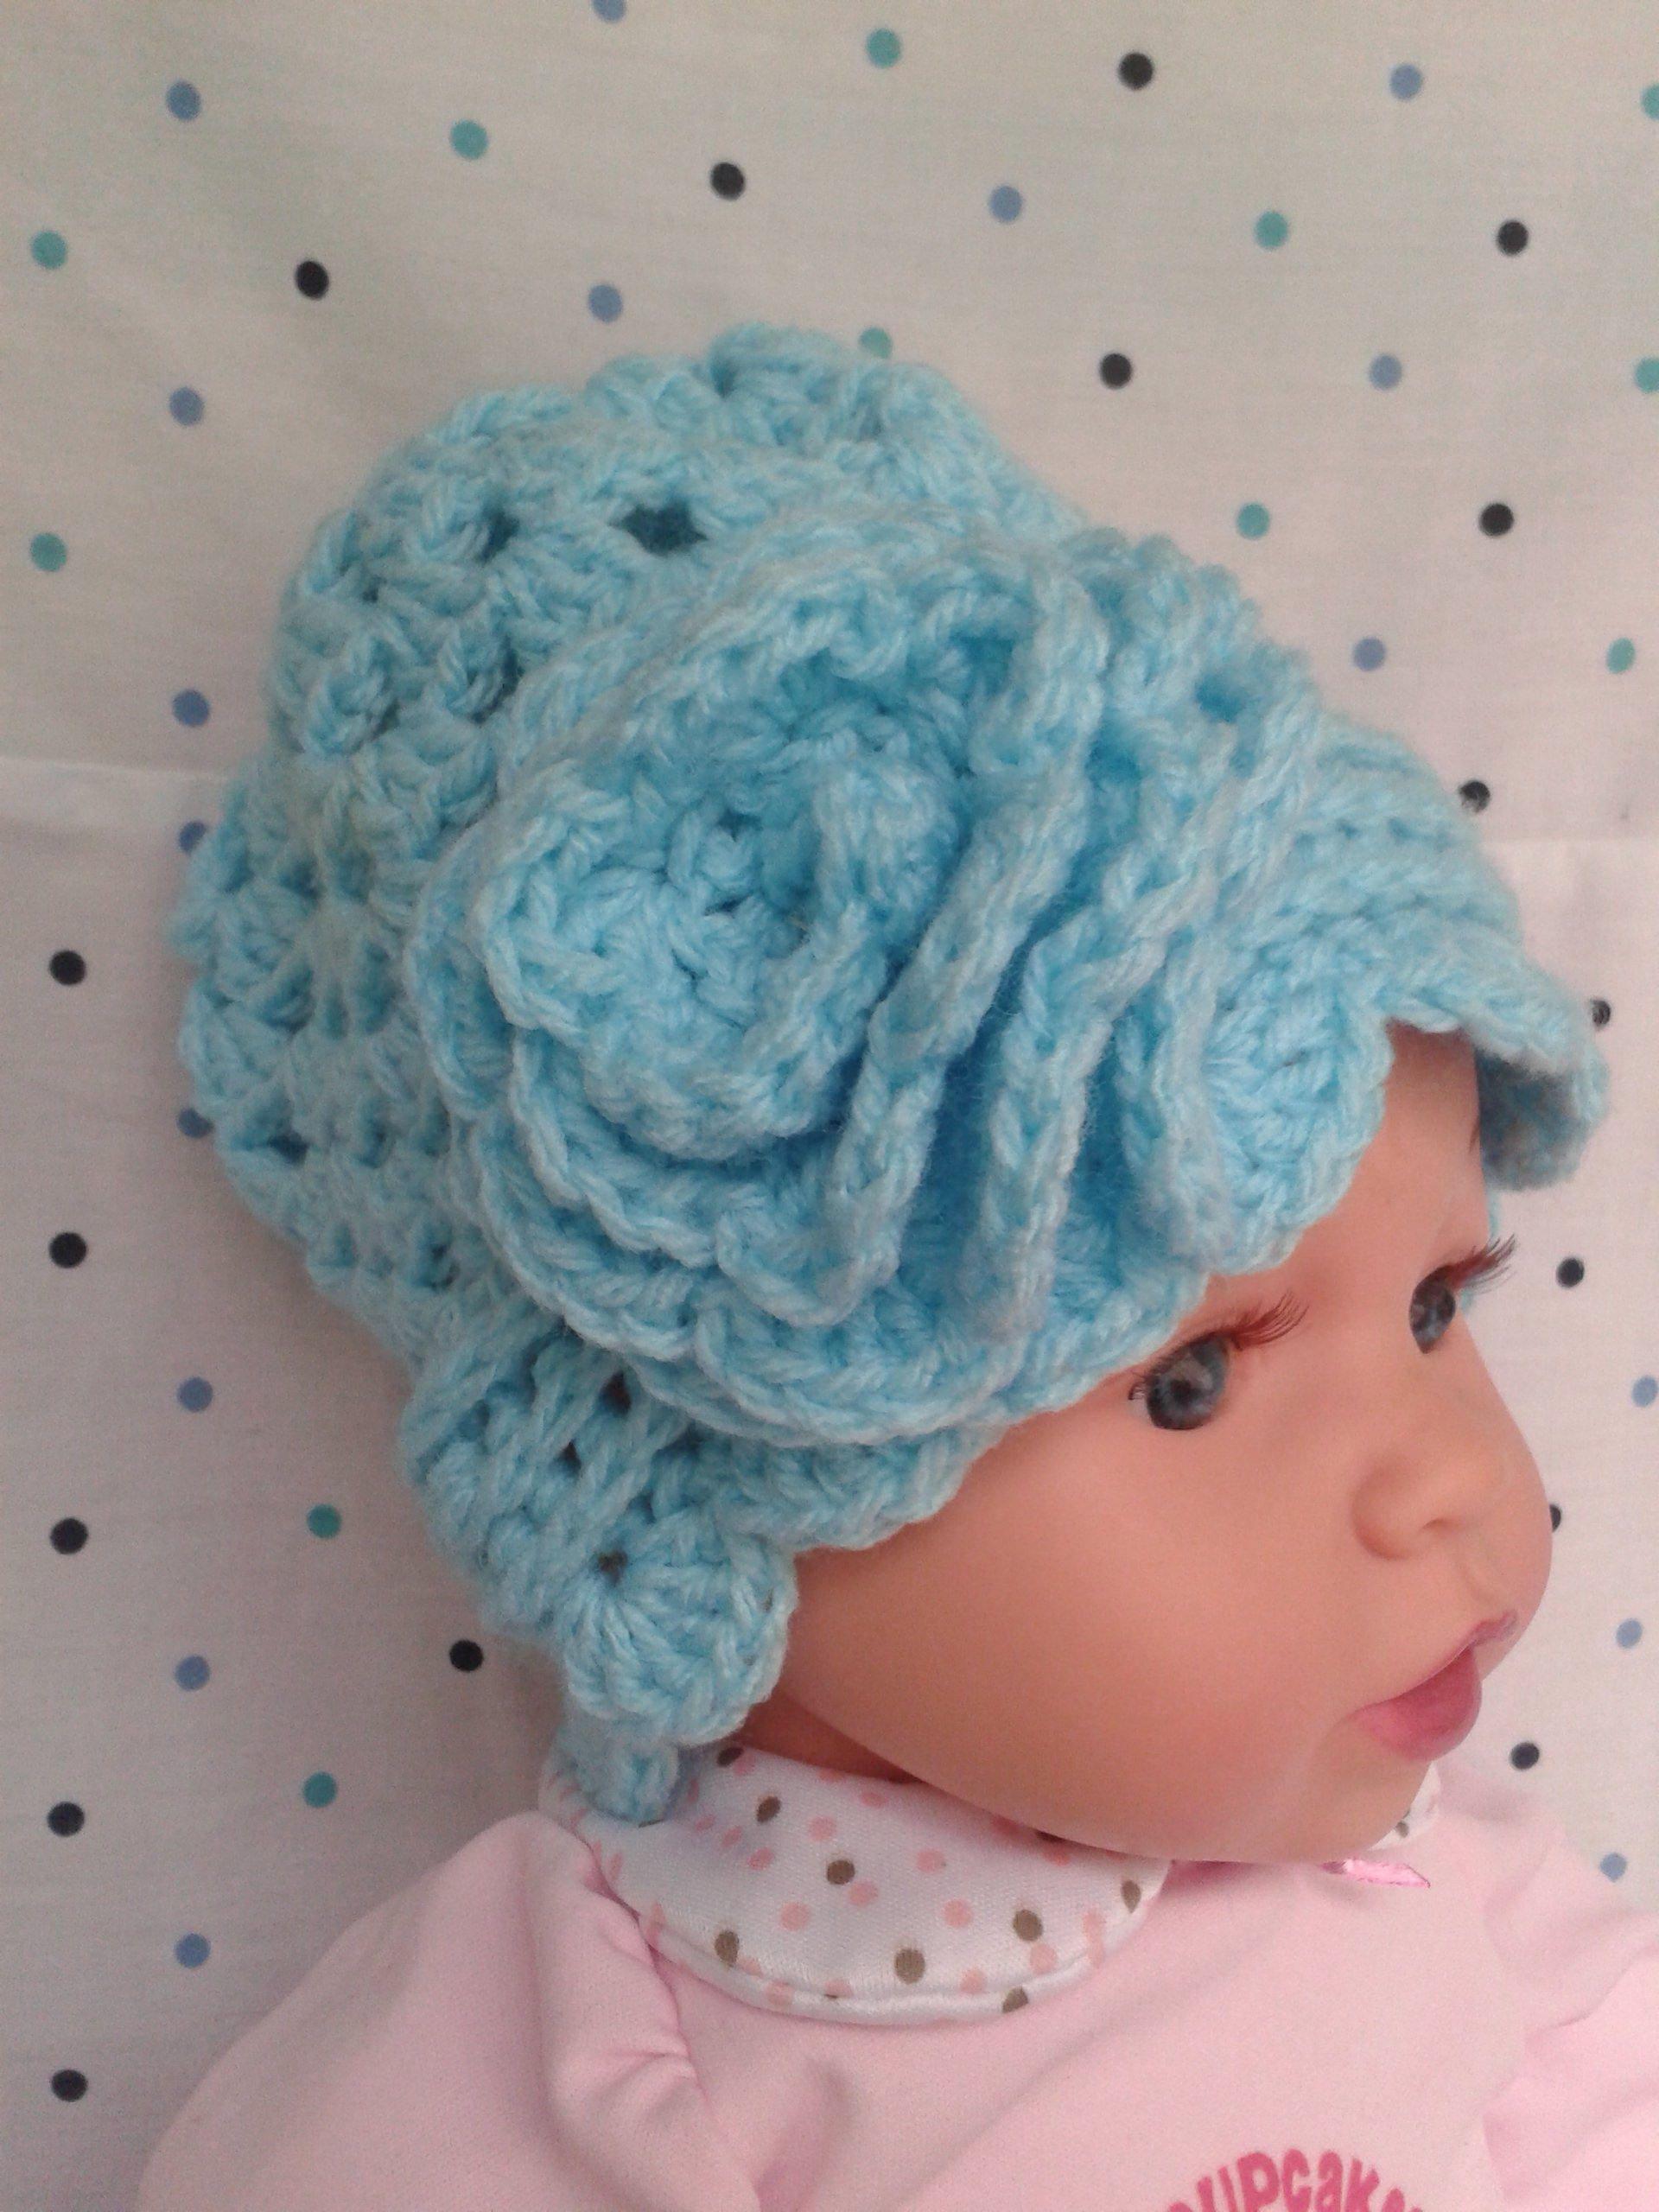 Handmade baby clothes newborn girl hats & headbands crochet baby